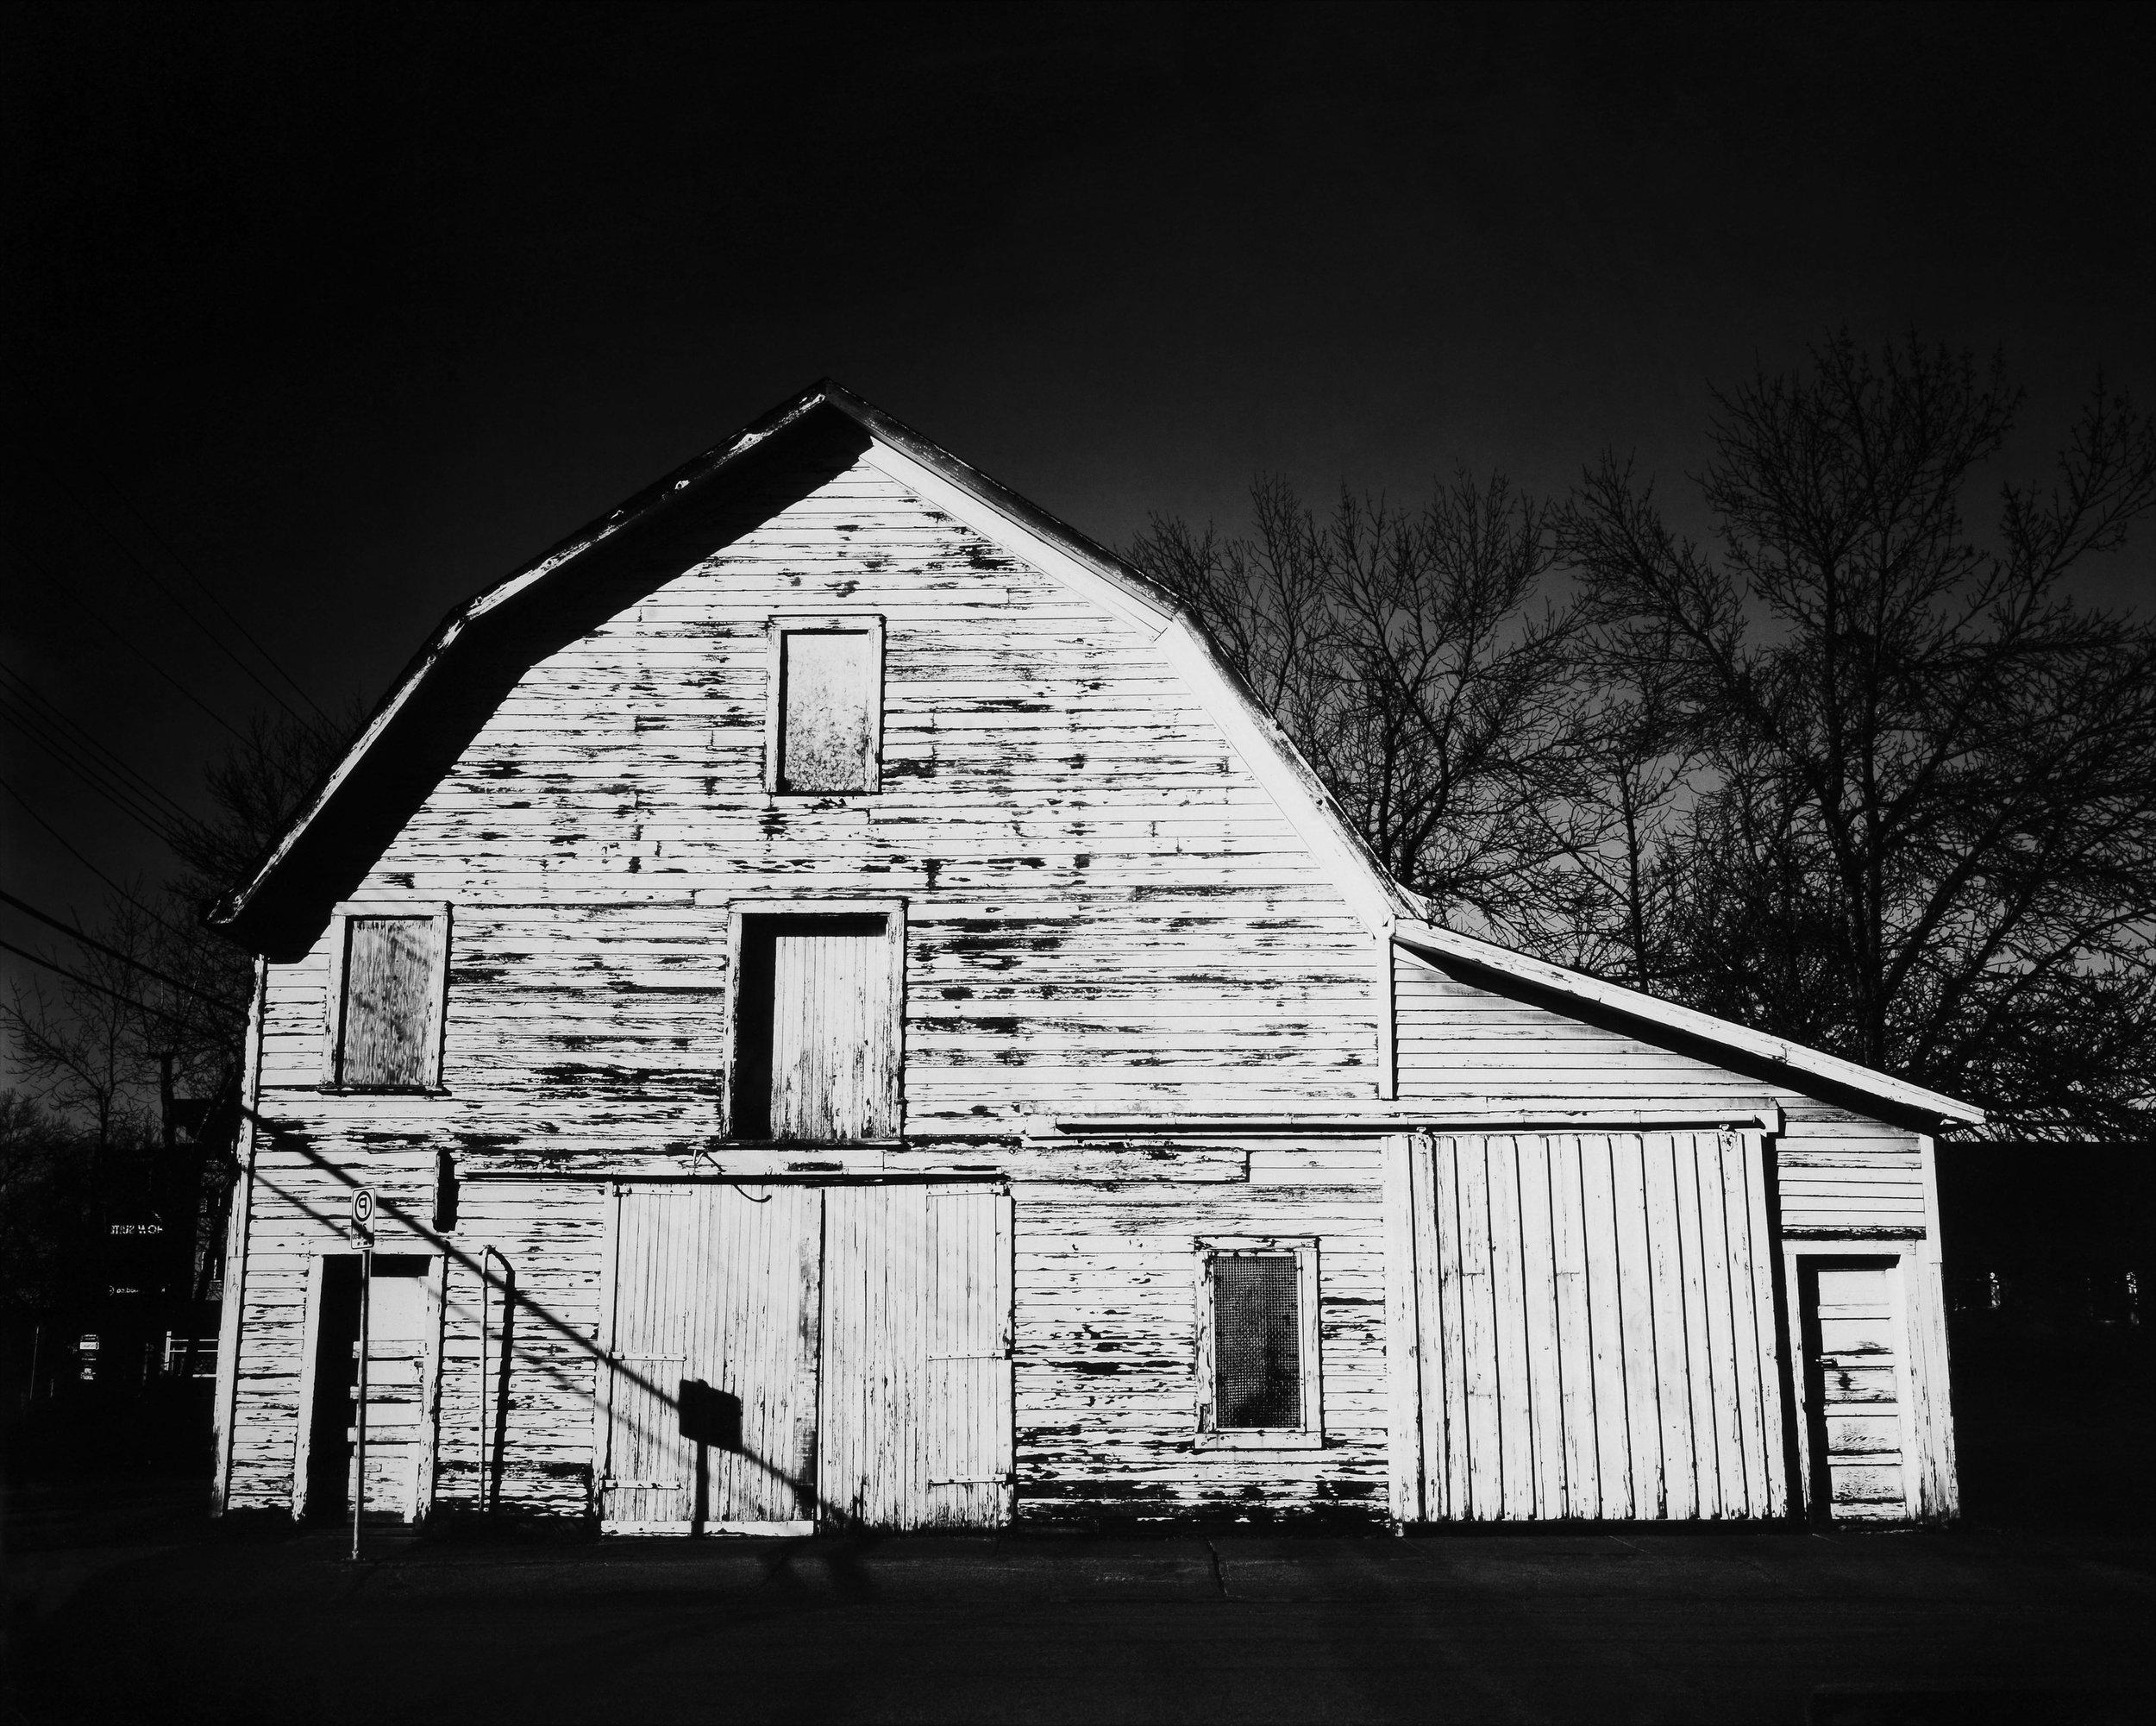 Reproduction - Inglewood Barn - Print - No Border.jpg